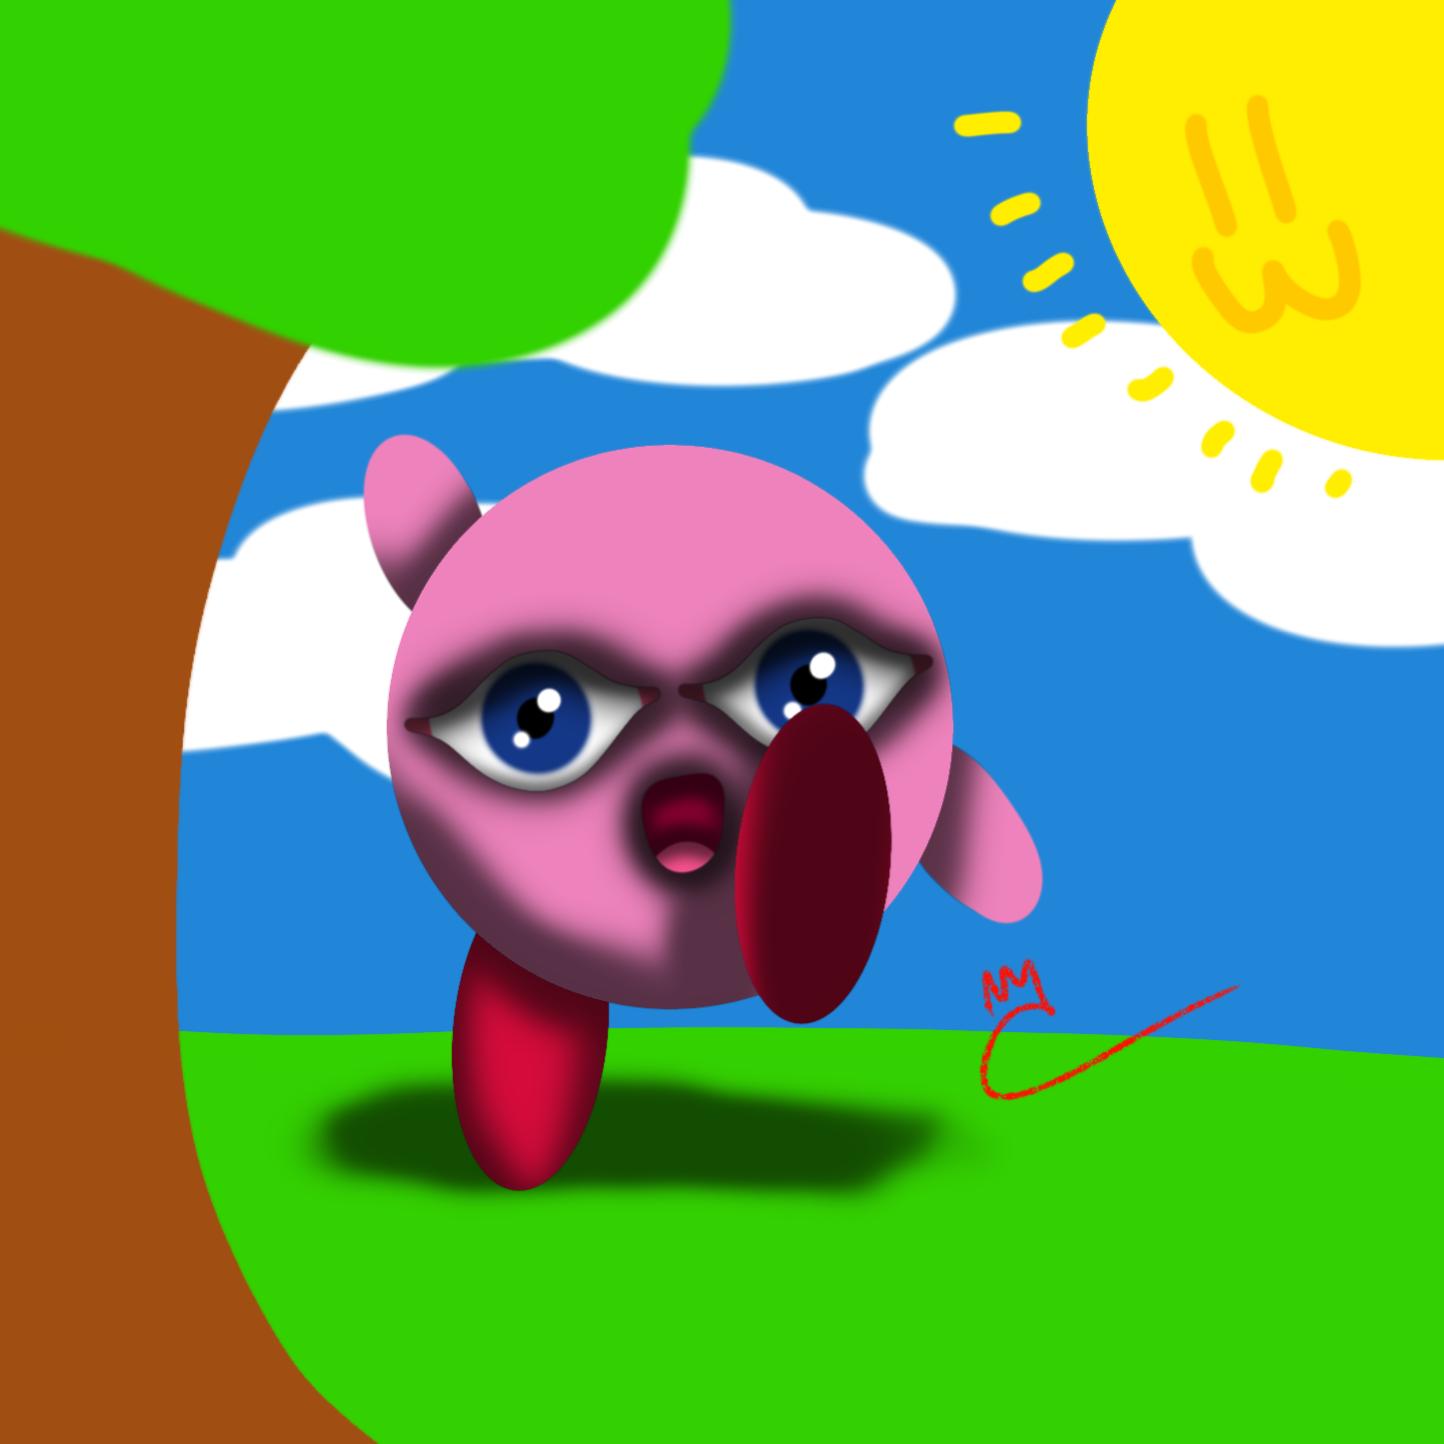 Happy Kirby fanart